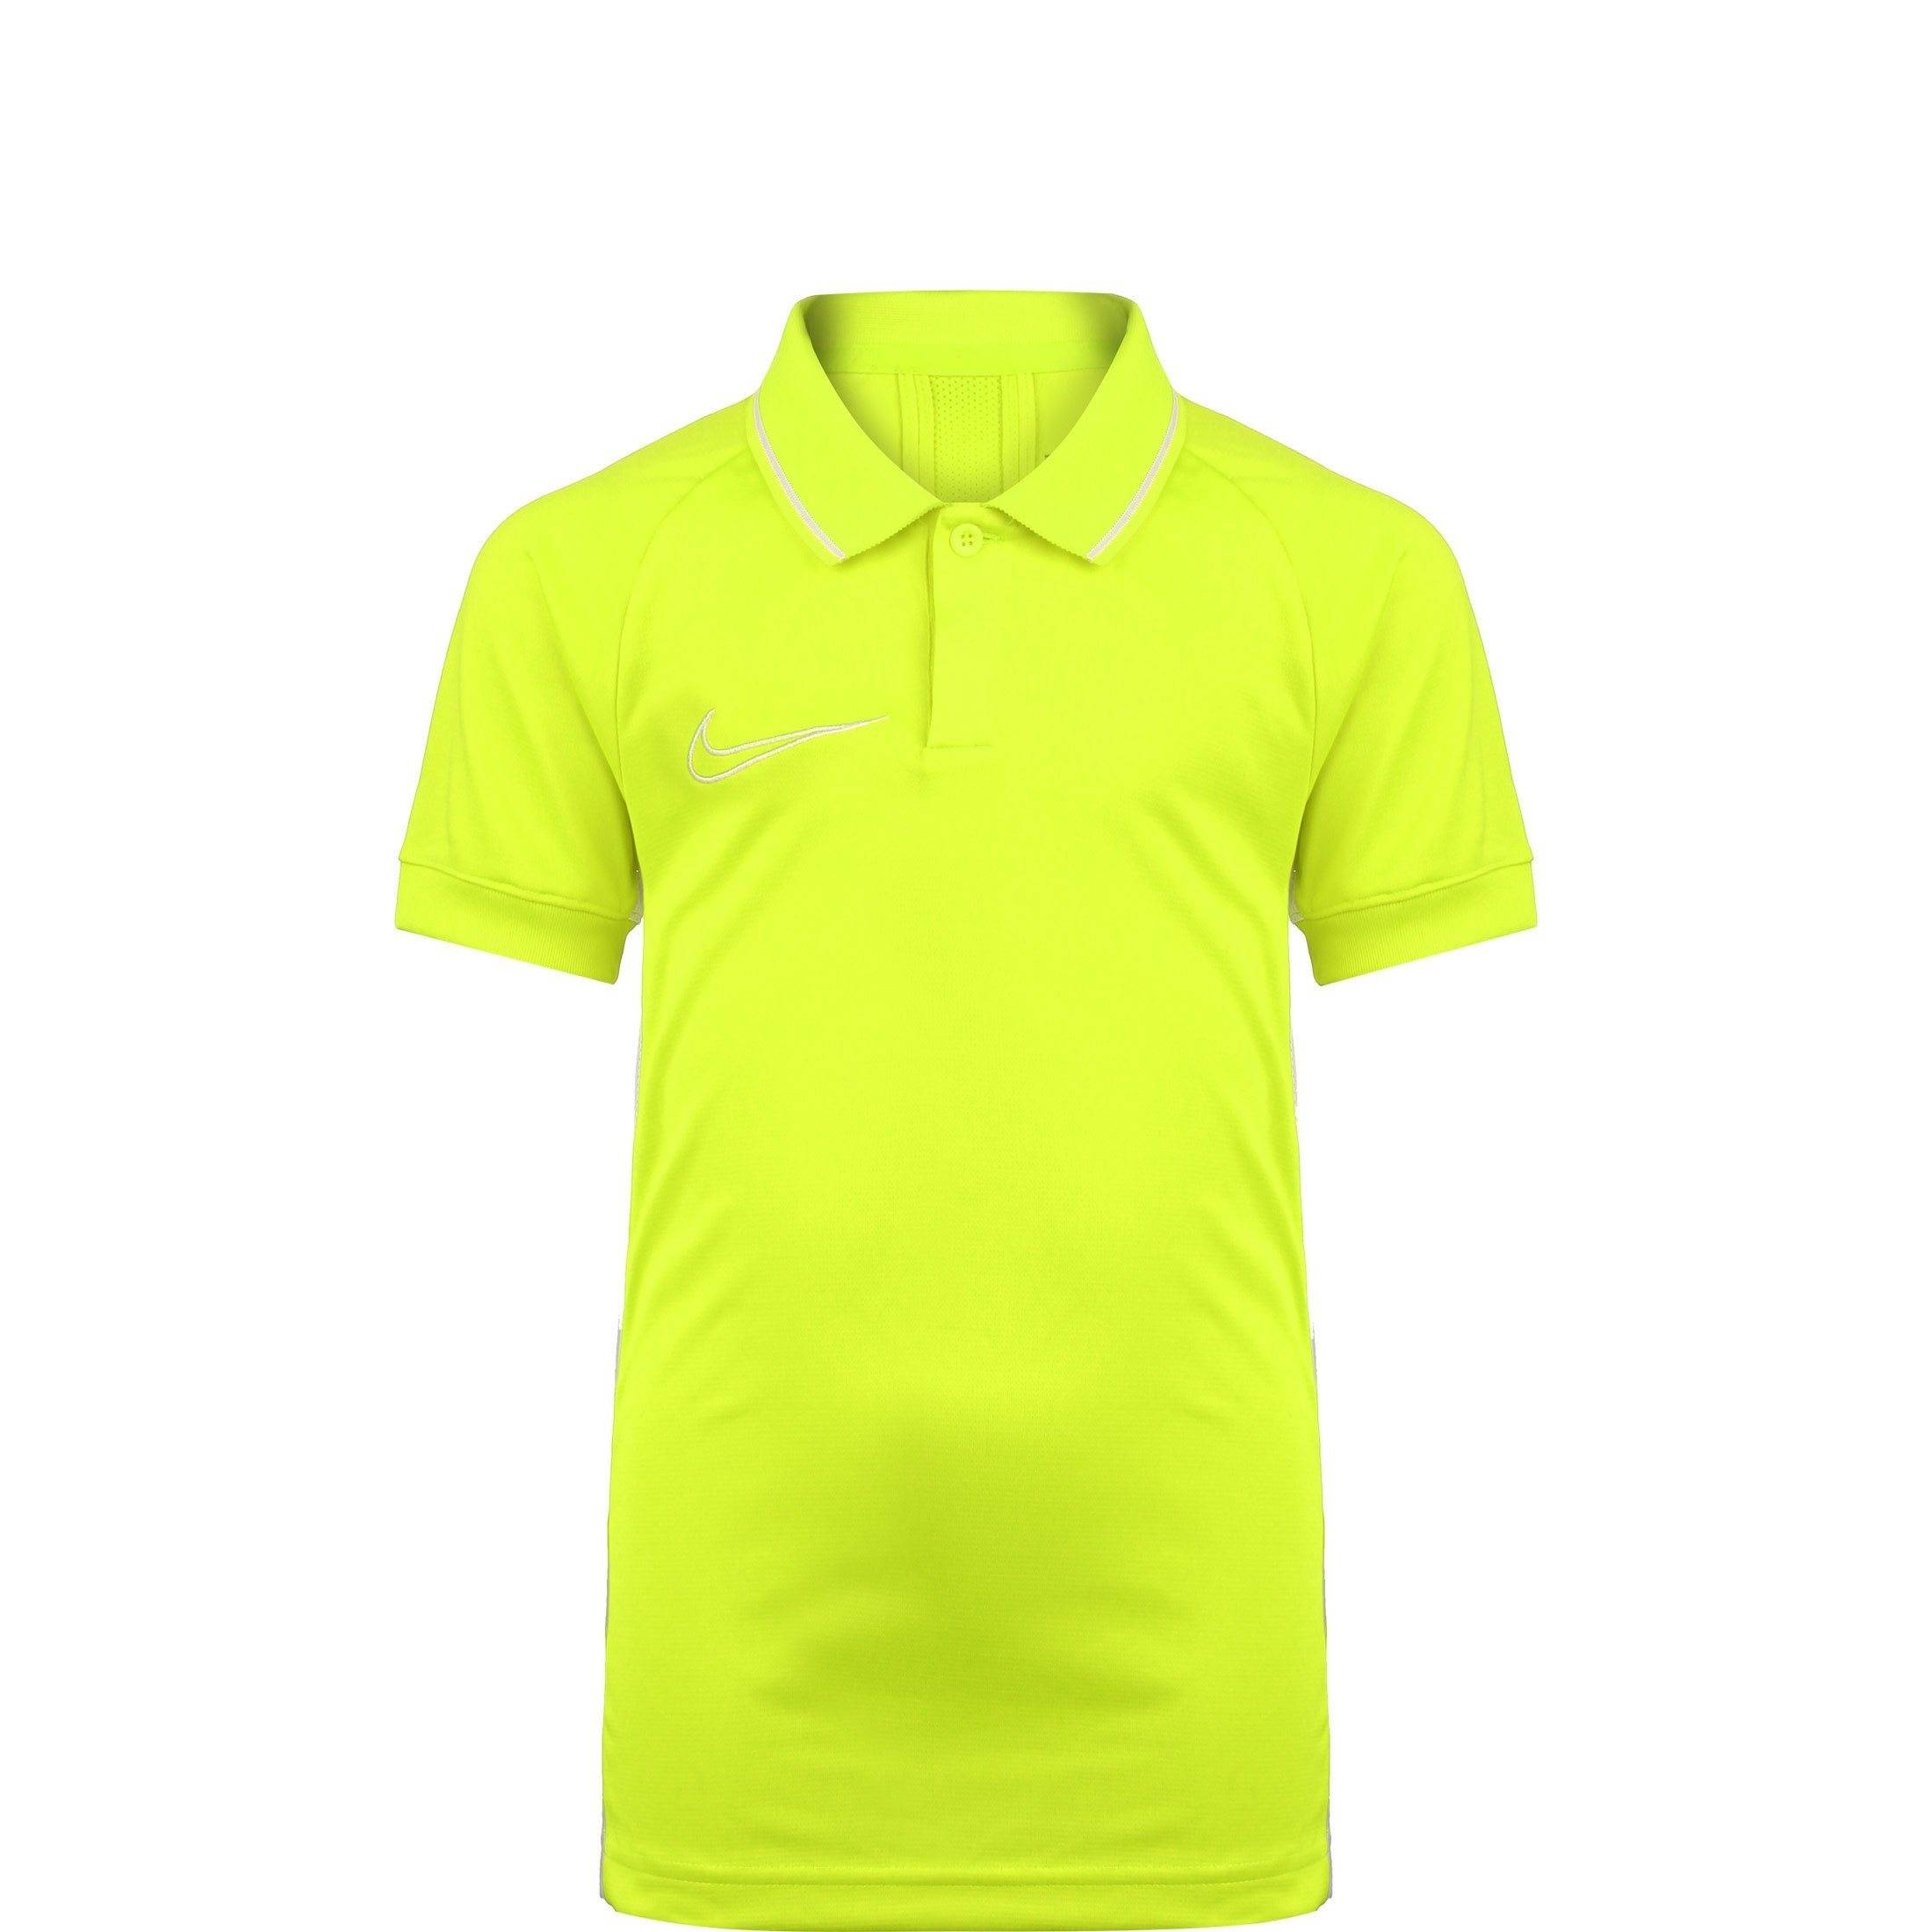 Nike Poloshirt »Dry Academy 19«, volt / white